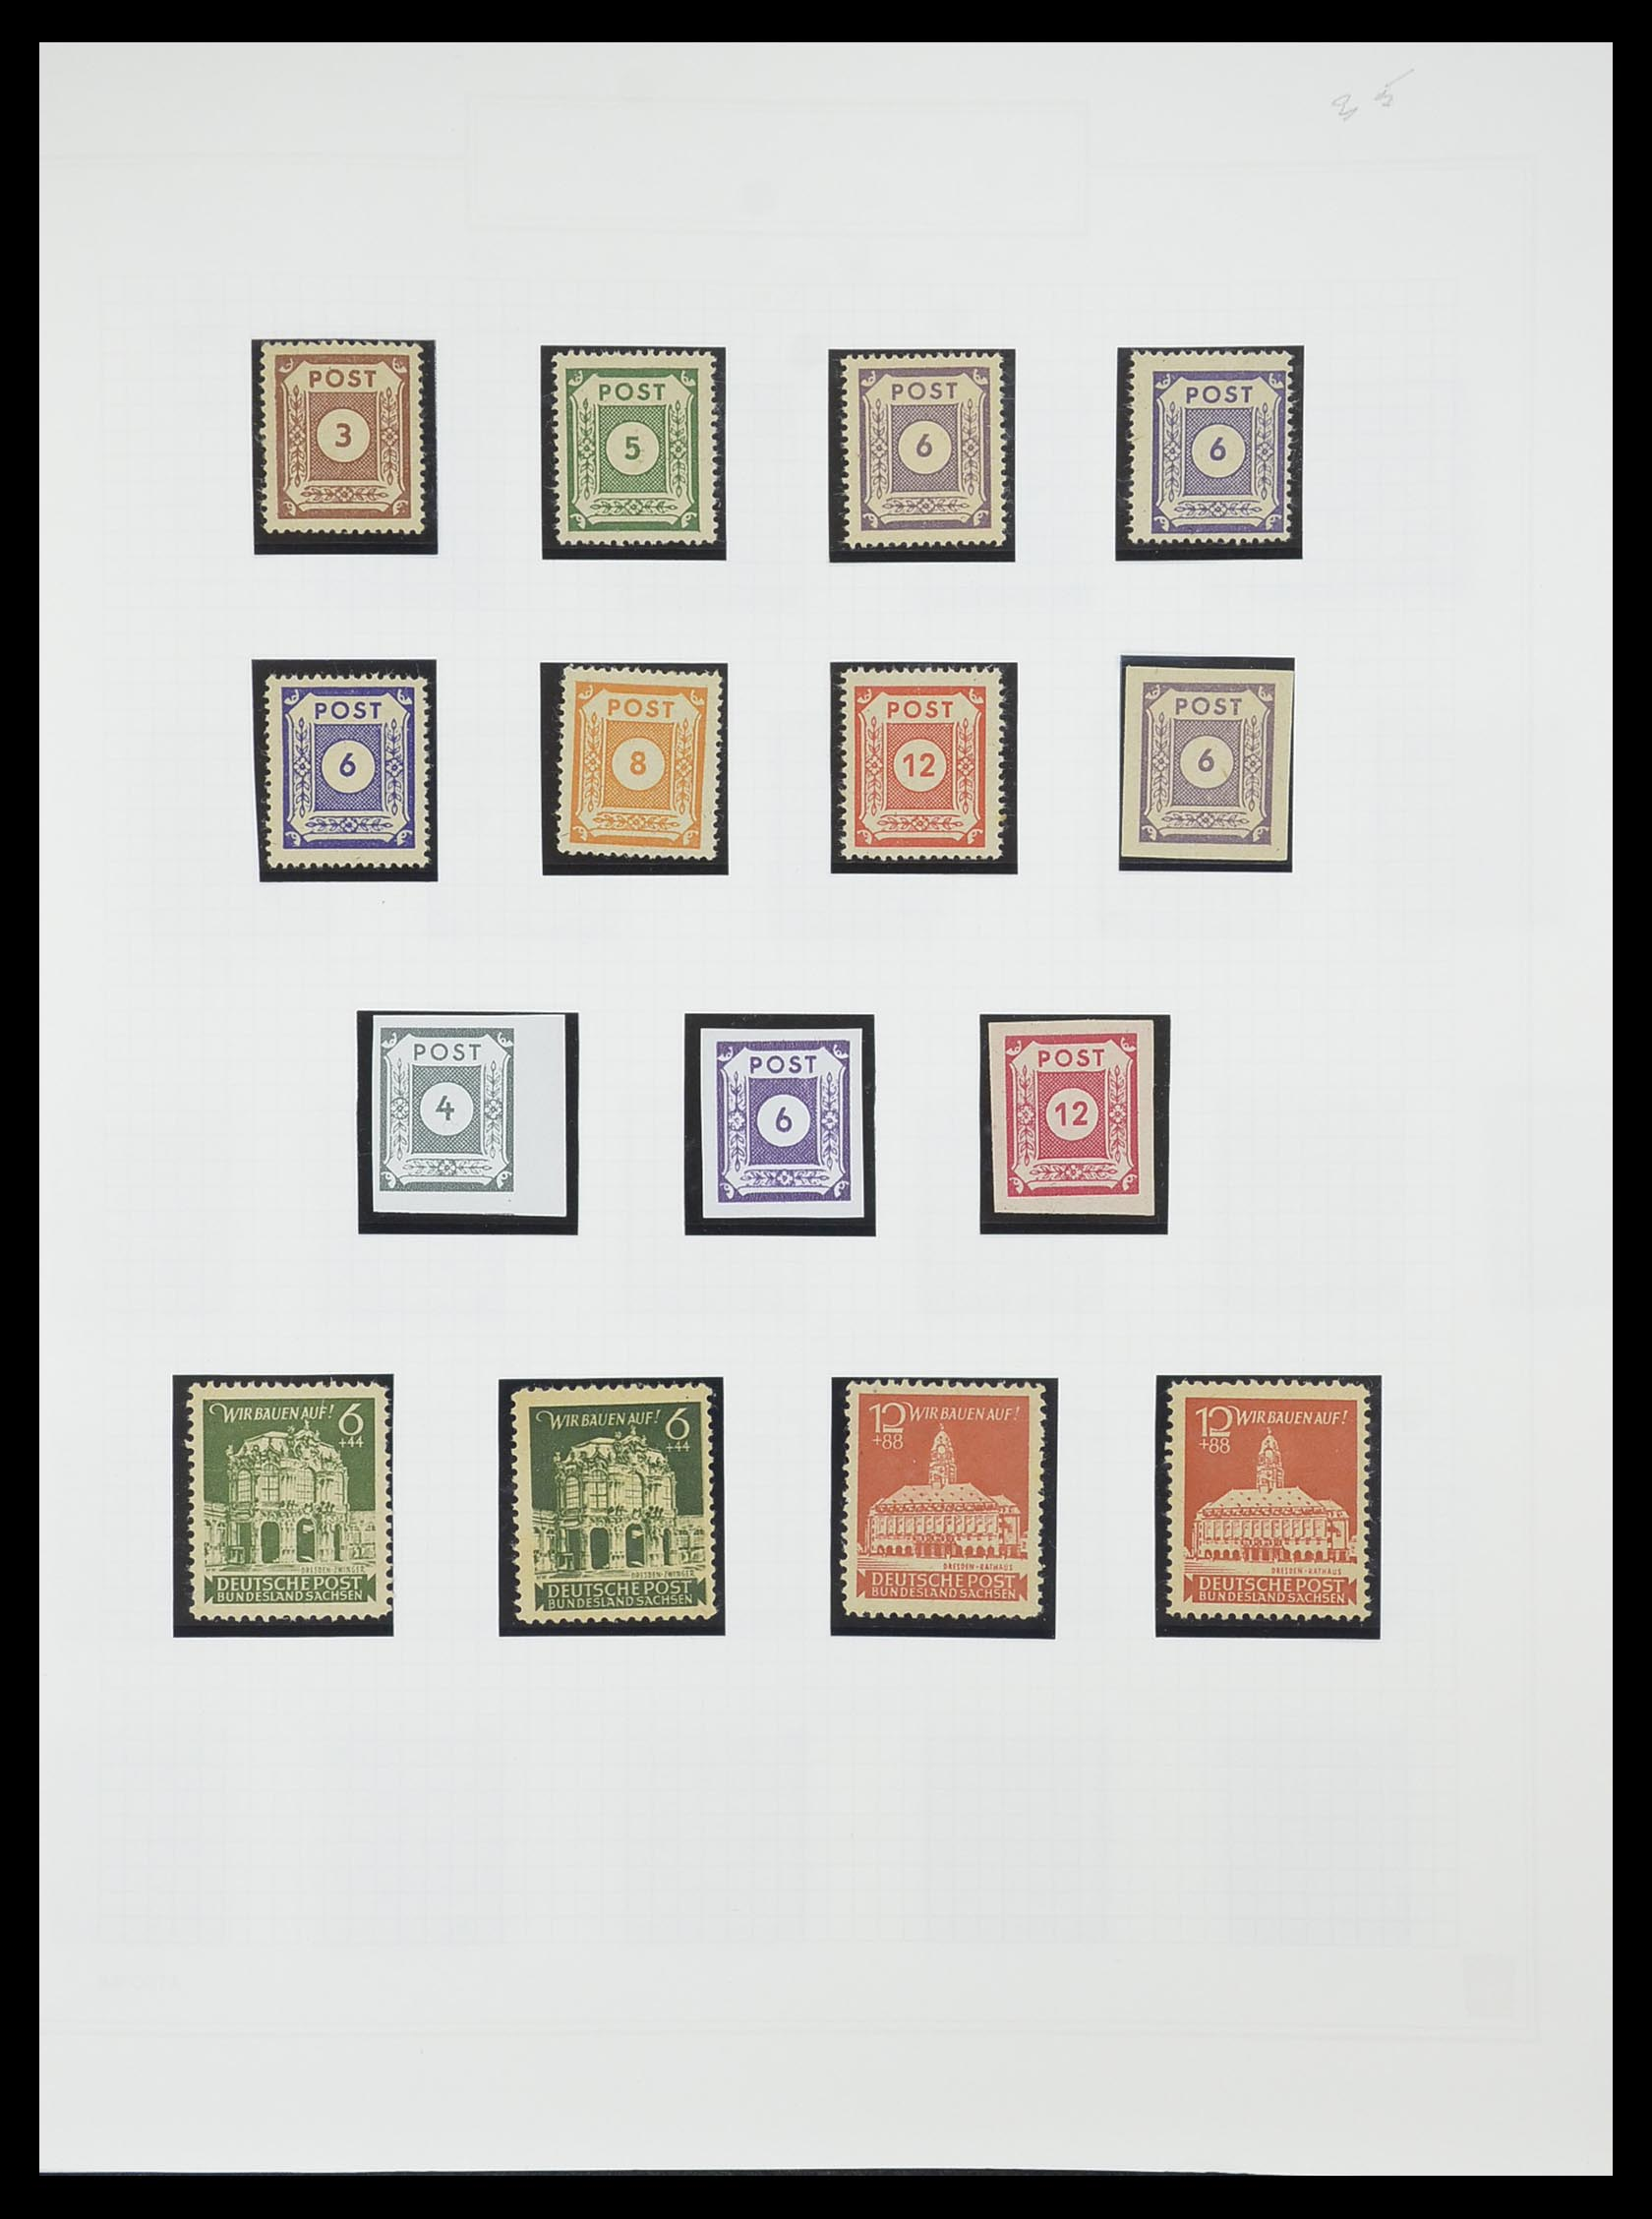 33698 019 - Postzegelverzameling 33698 Sovjet Zone 1945-1948.